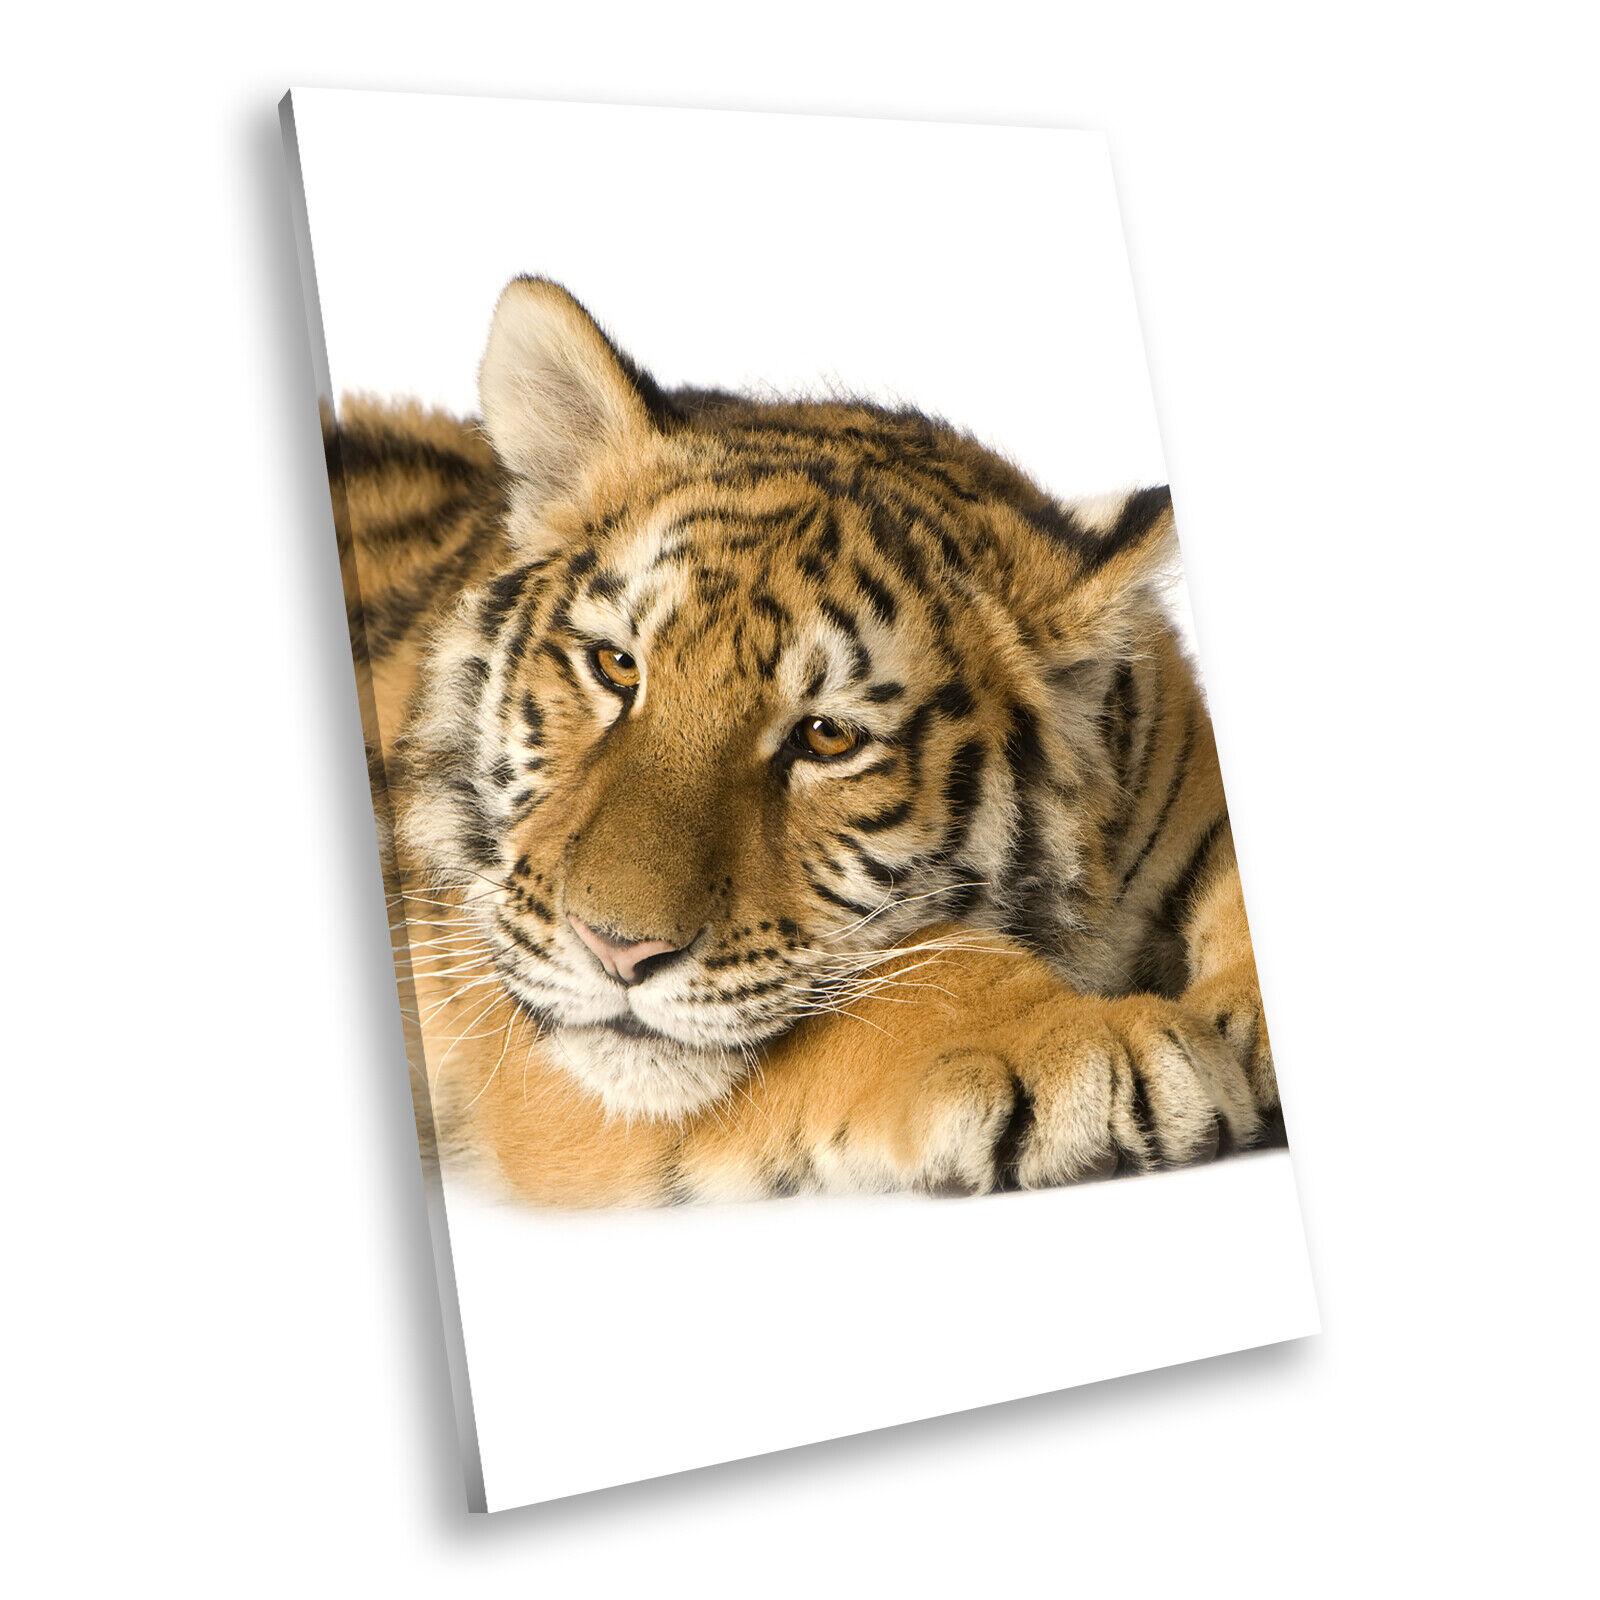 Tiger Cub Orange Weiß Portrait Animal Canvas Framed Art Large Picture